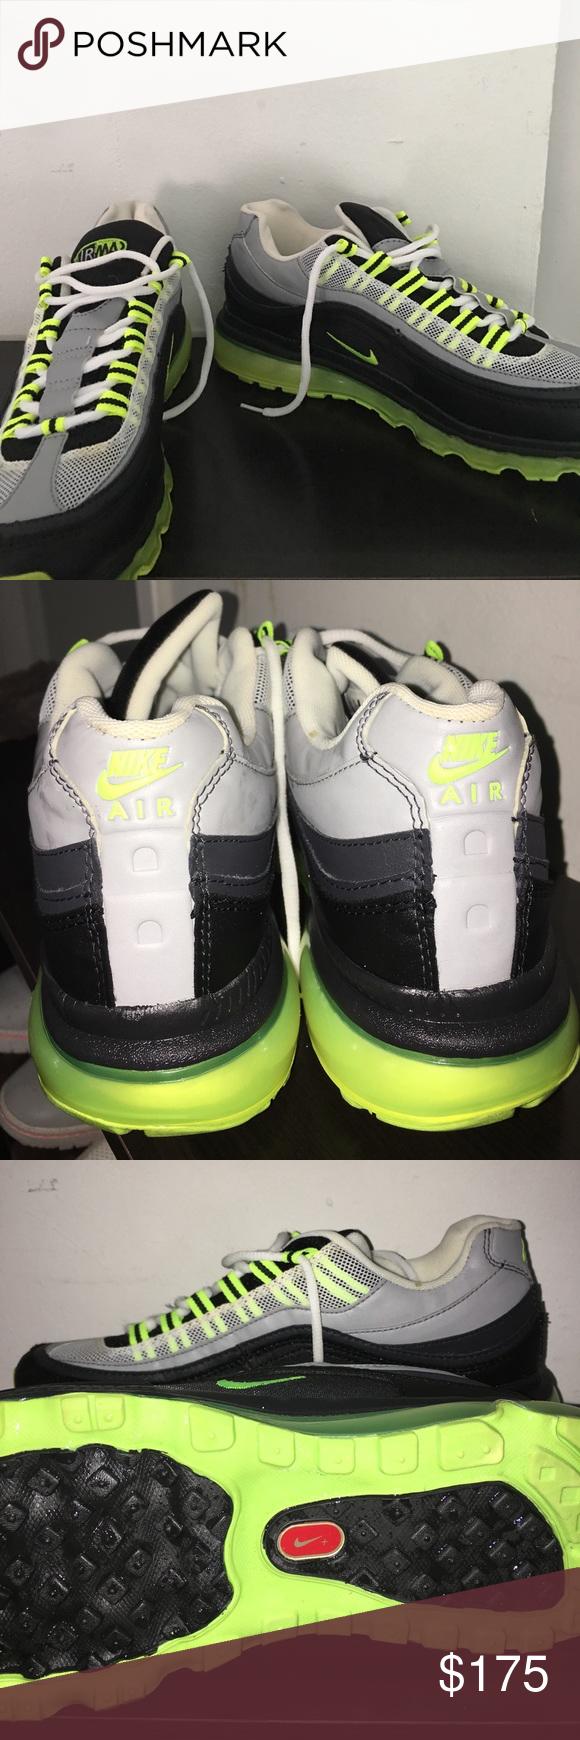 9b0384490169 Nike Air Max 24-7 MENS Worn Twice Over The Summer (Semi-New) Neon-Green